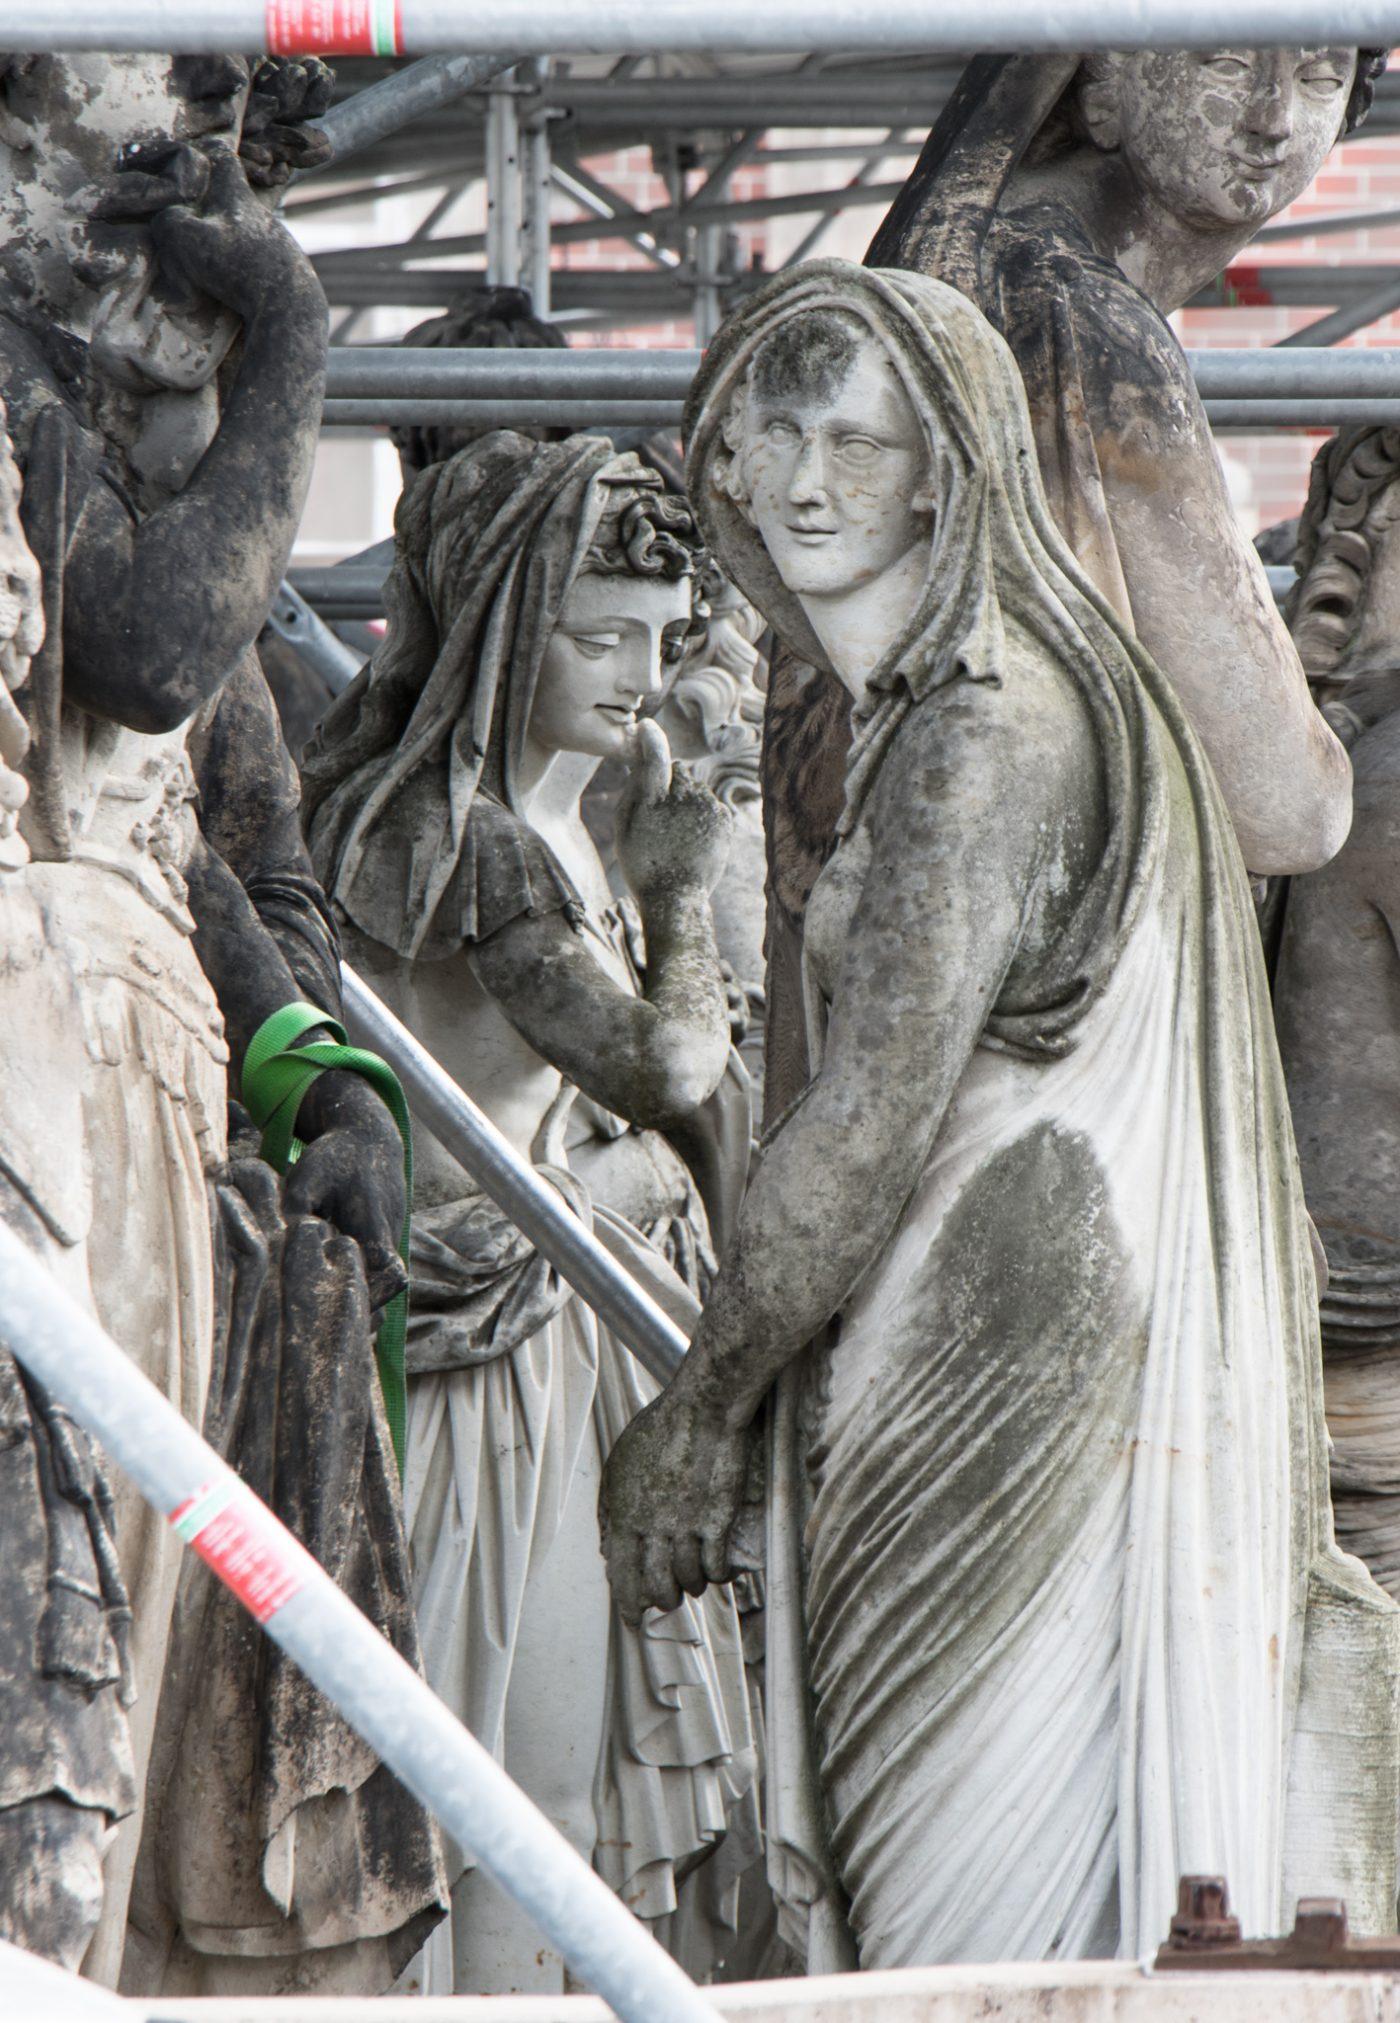 Skulpturen am Neuen Palais im Park Sansoucci in Potsdam